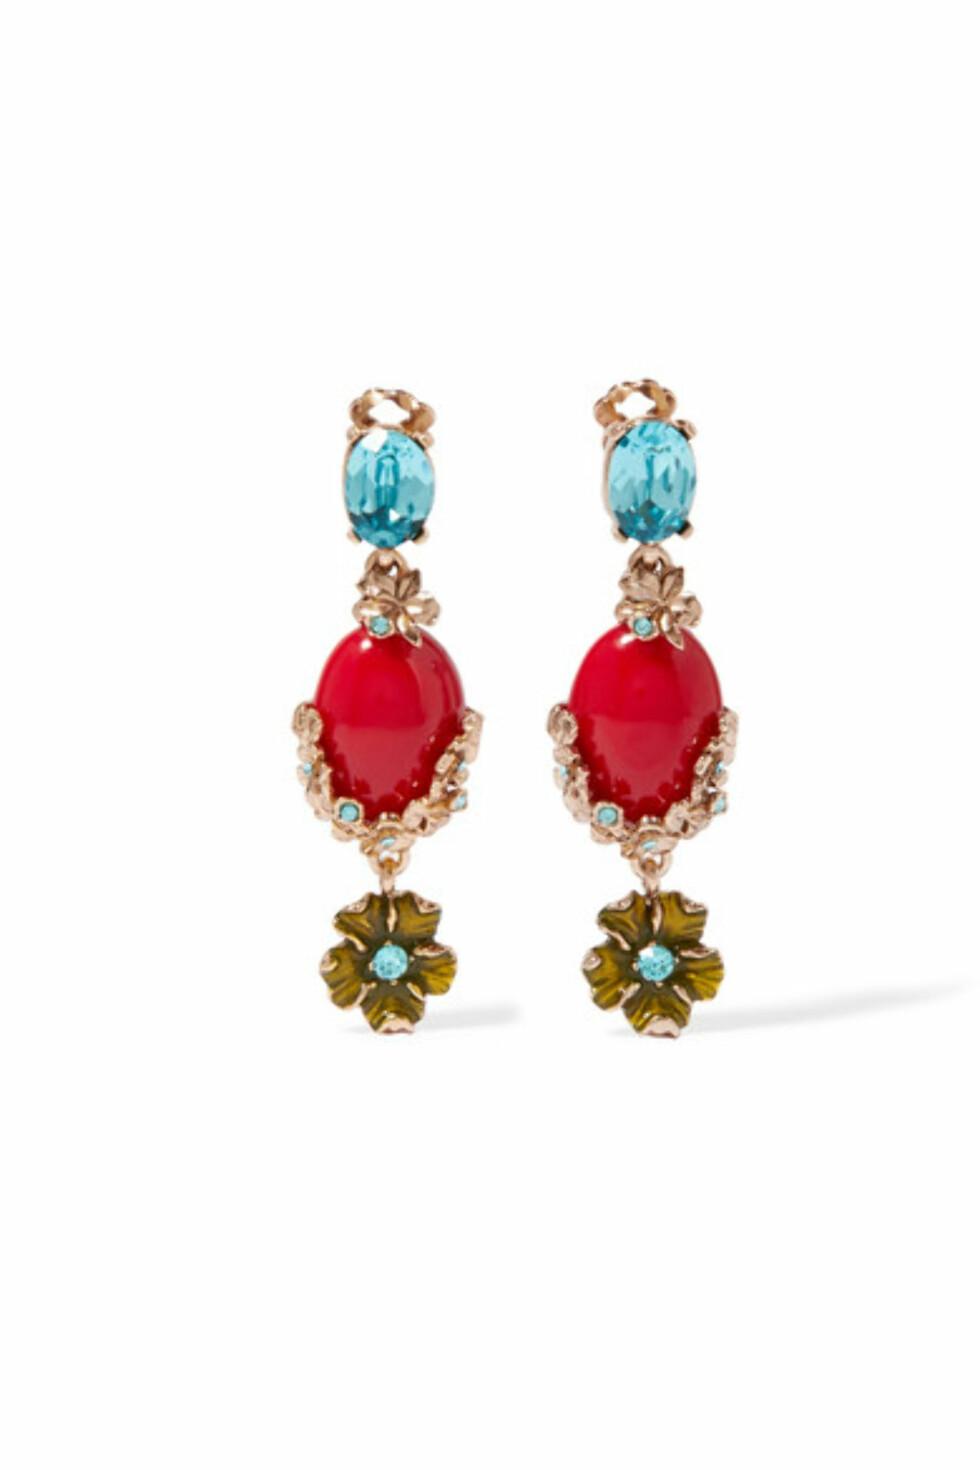 Øredobber fra Oscar de la Renta via Net-a-porter.com | kr 2792 | https://www.net-a-porter.com/no/en/product/801257/oscar_de_la_renta/gold-plated--swarovski-crystal-and-resin-clip-earrings